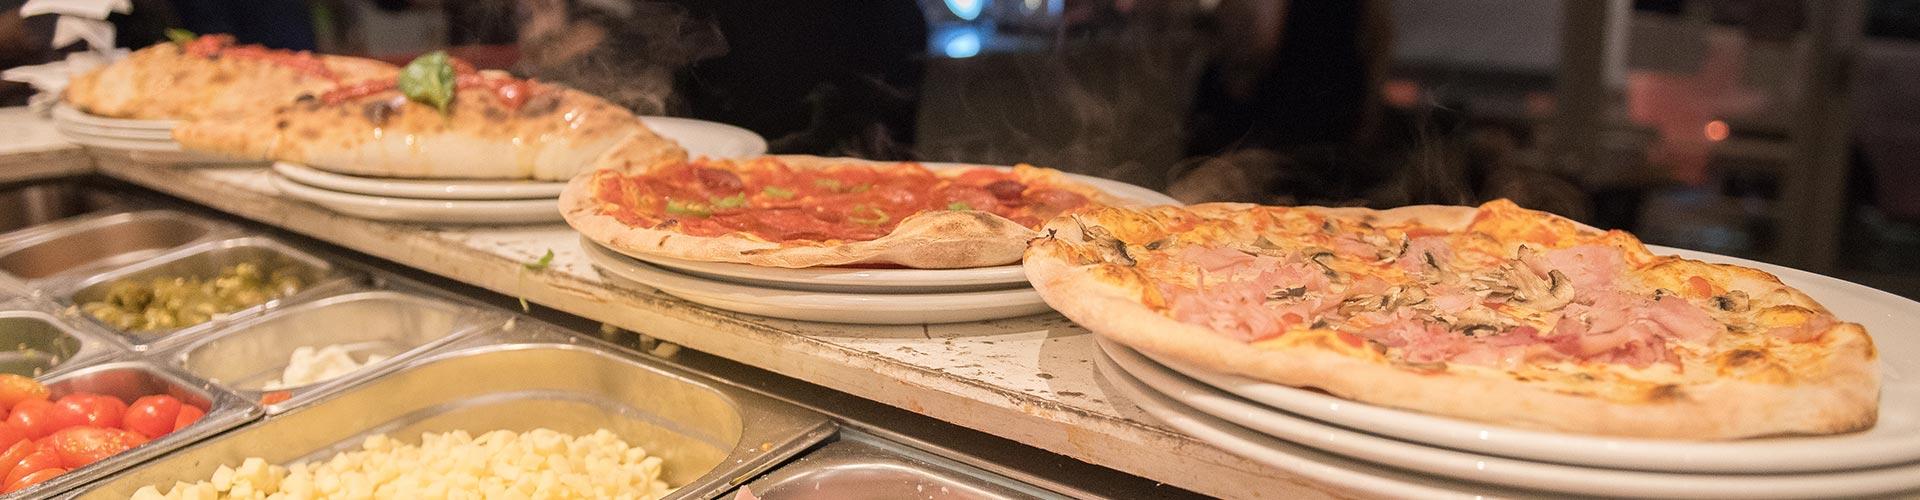 Best Italian Restaurant in Hackney - Bella Vita